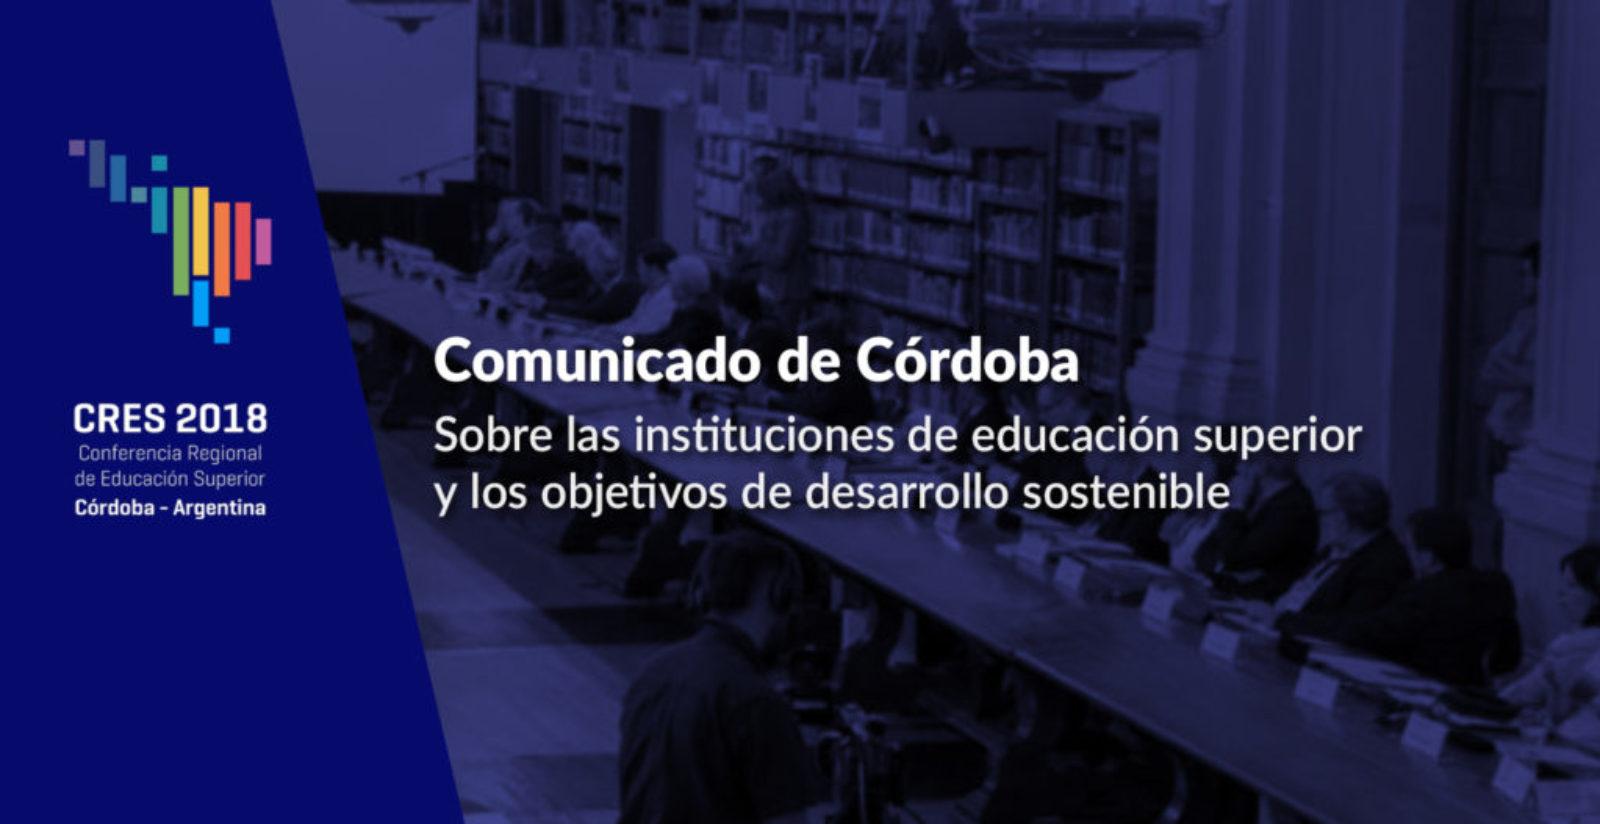 ComunicadoCordoba